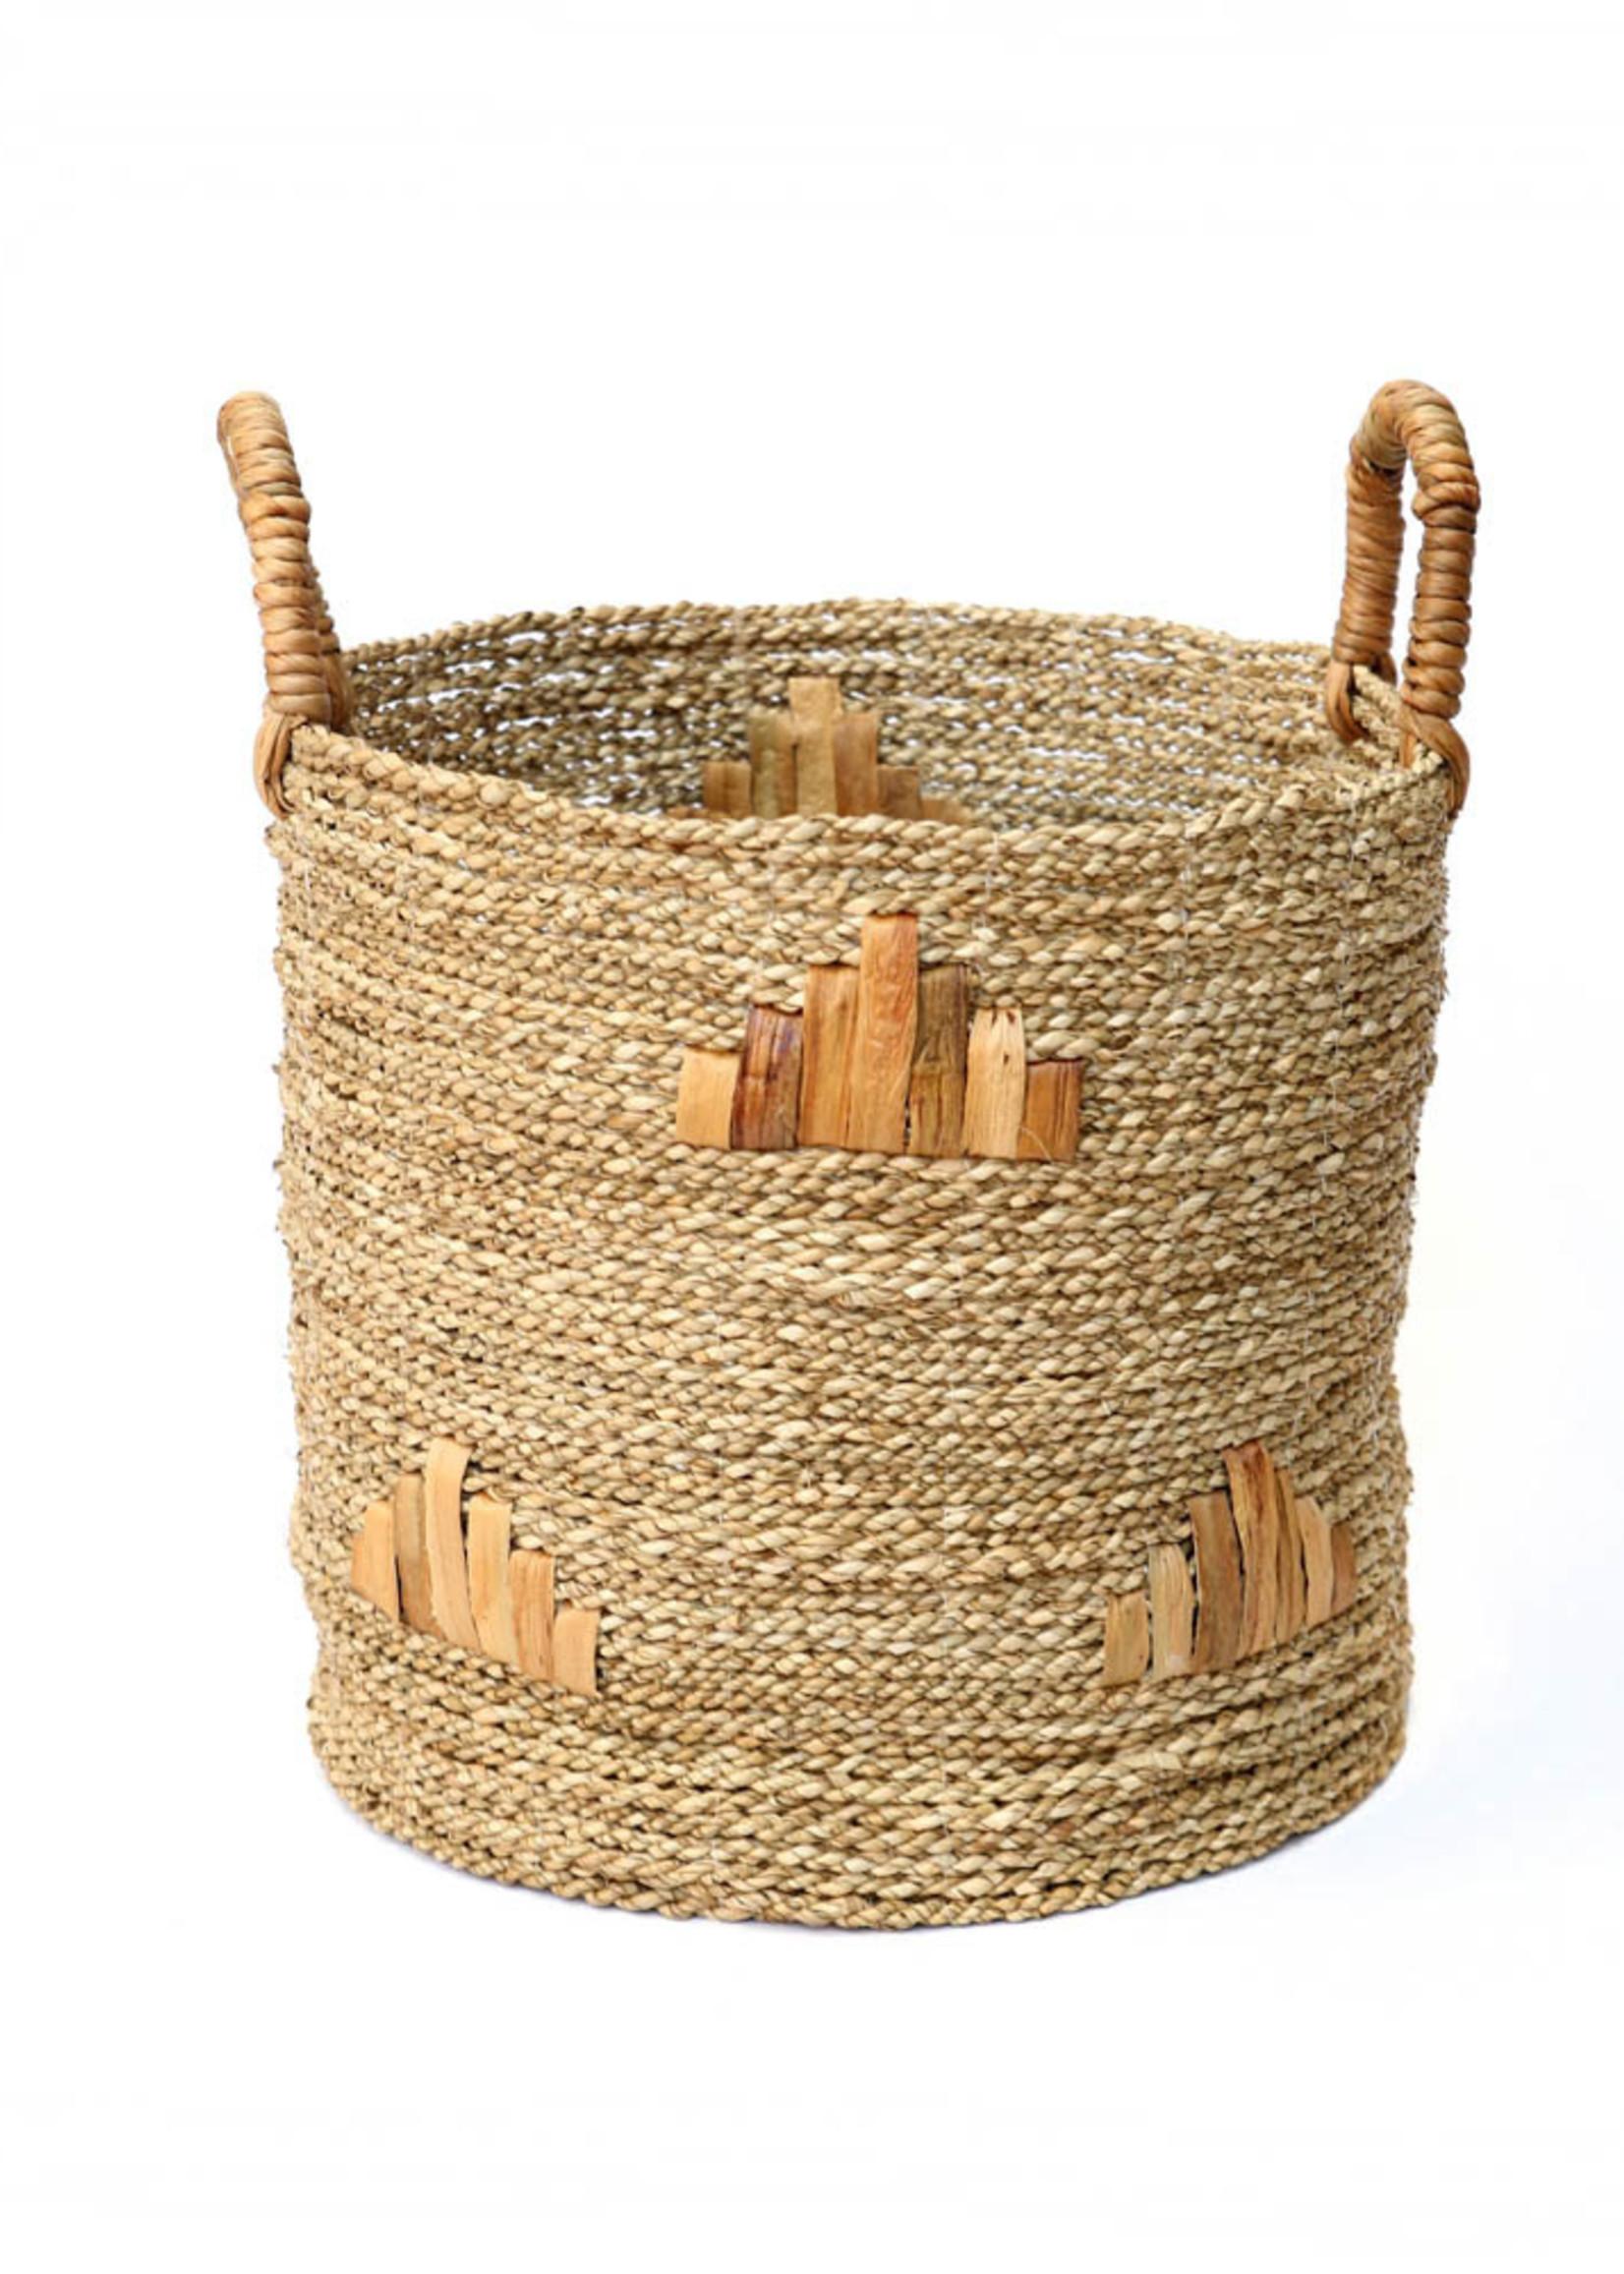 The Twiggy Graphic Baskets - Medium